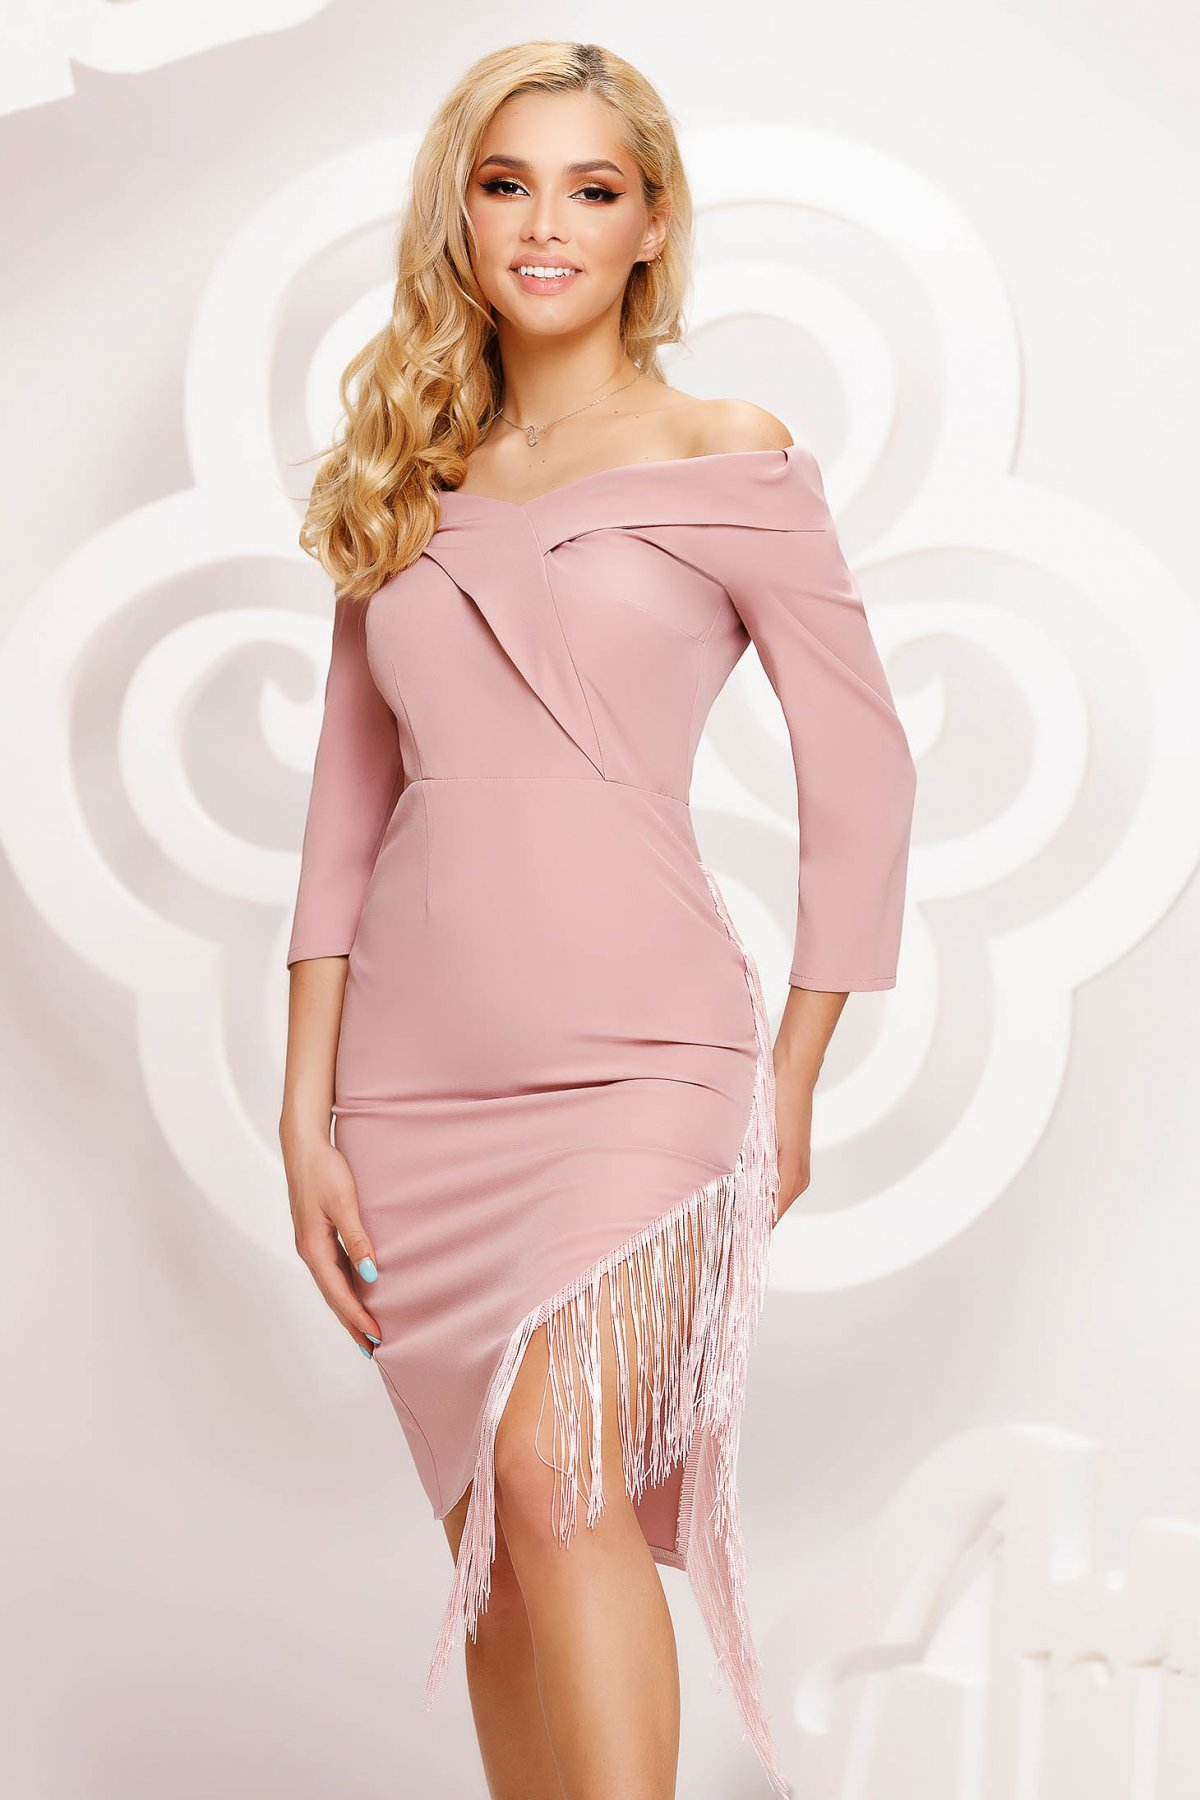 Rochie roz prafuit Artista scurta asimetrica de ocazie din material elastic cu franjuri pe umeri - medelin.ro